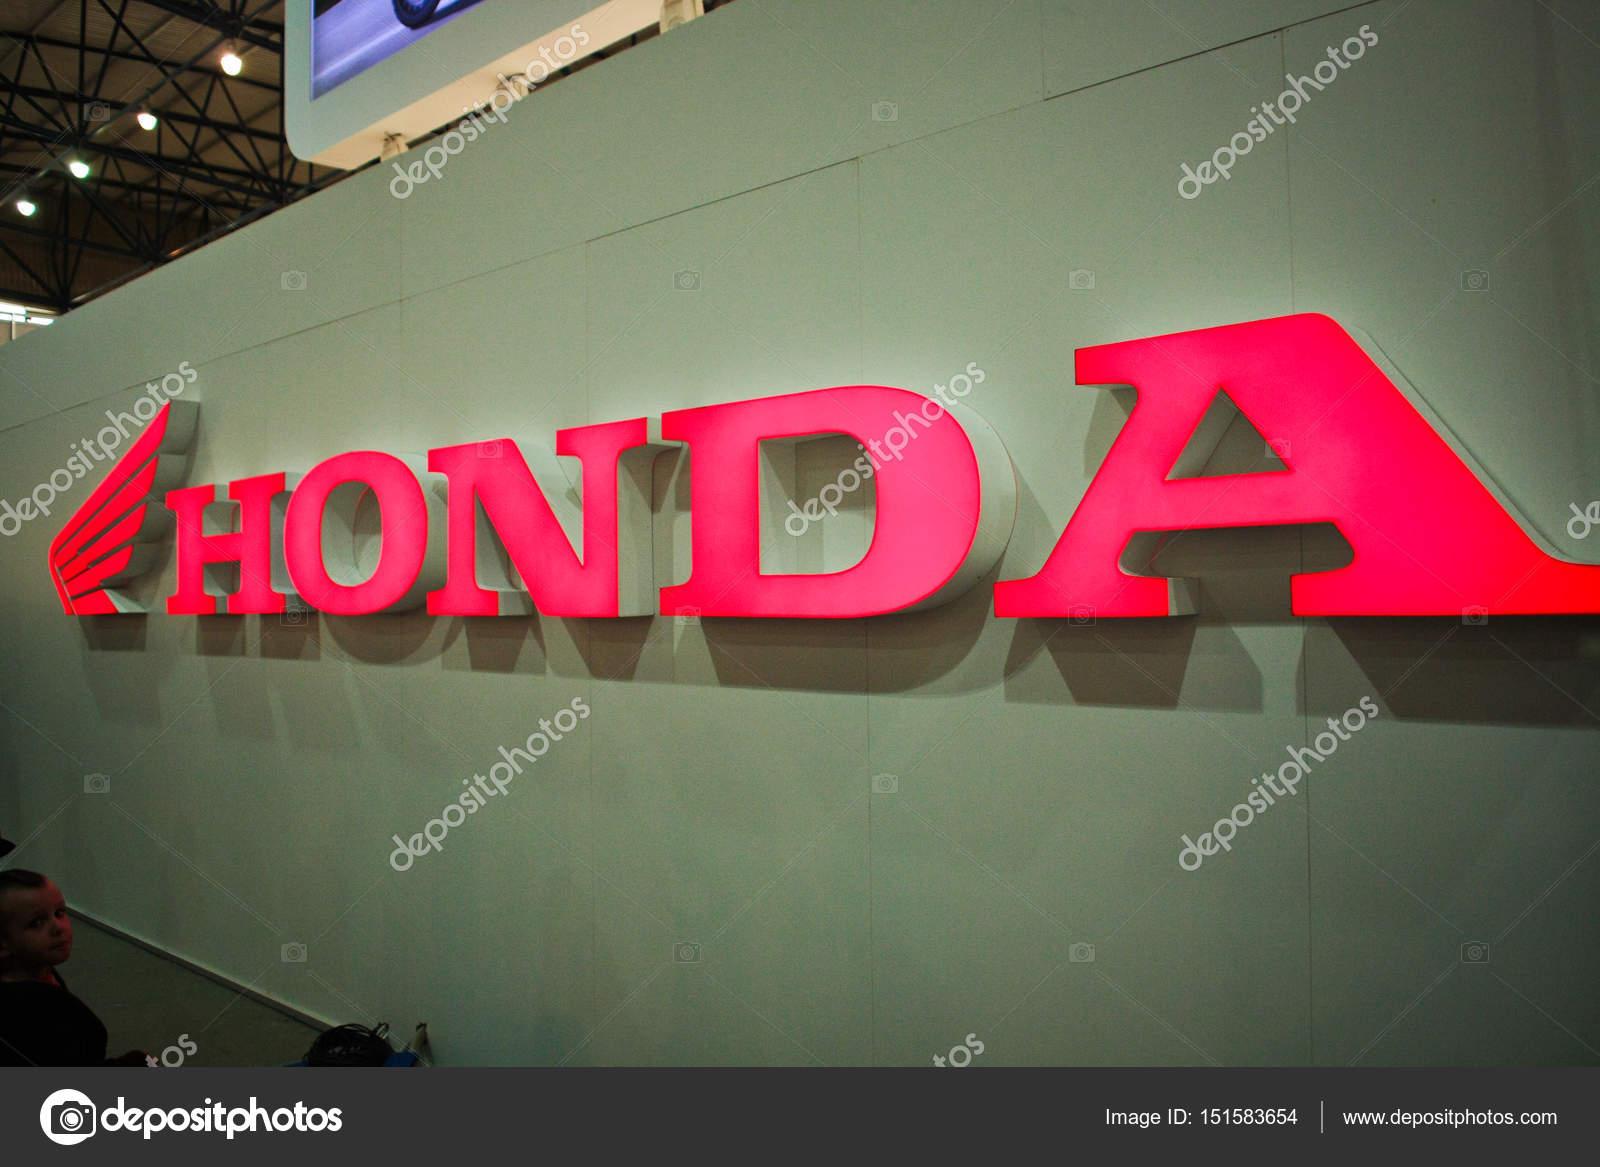 Logo HondaHonda LogotypeHonda International Industrial Company For The Production Of Cars And MotorcyclesDetail Honda Stand Photo By Bondvit